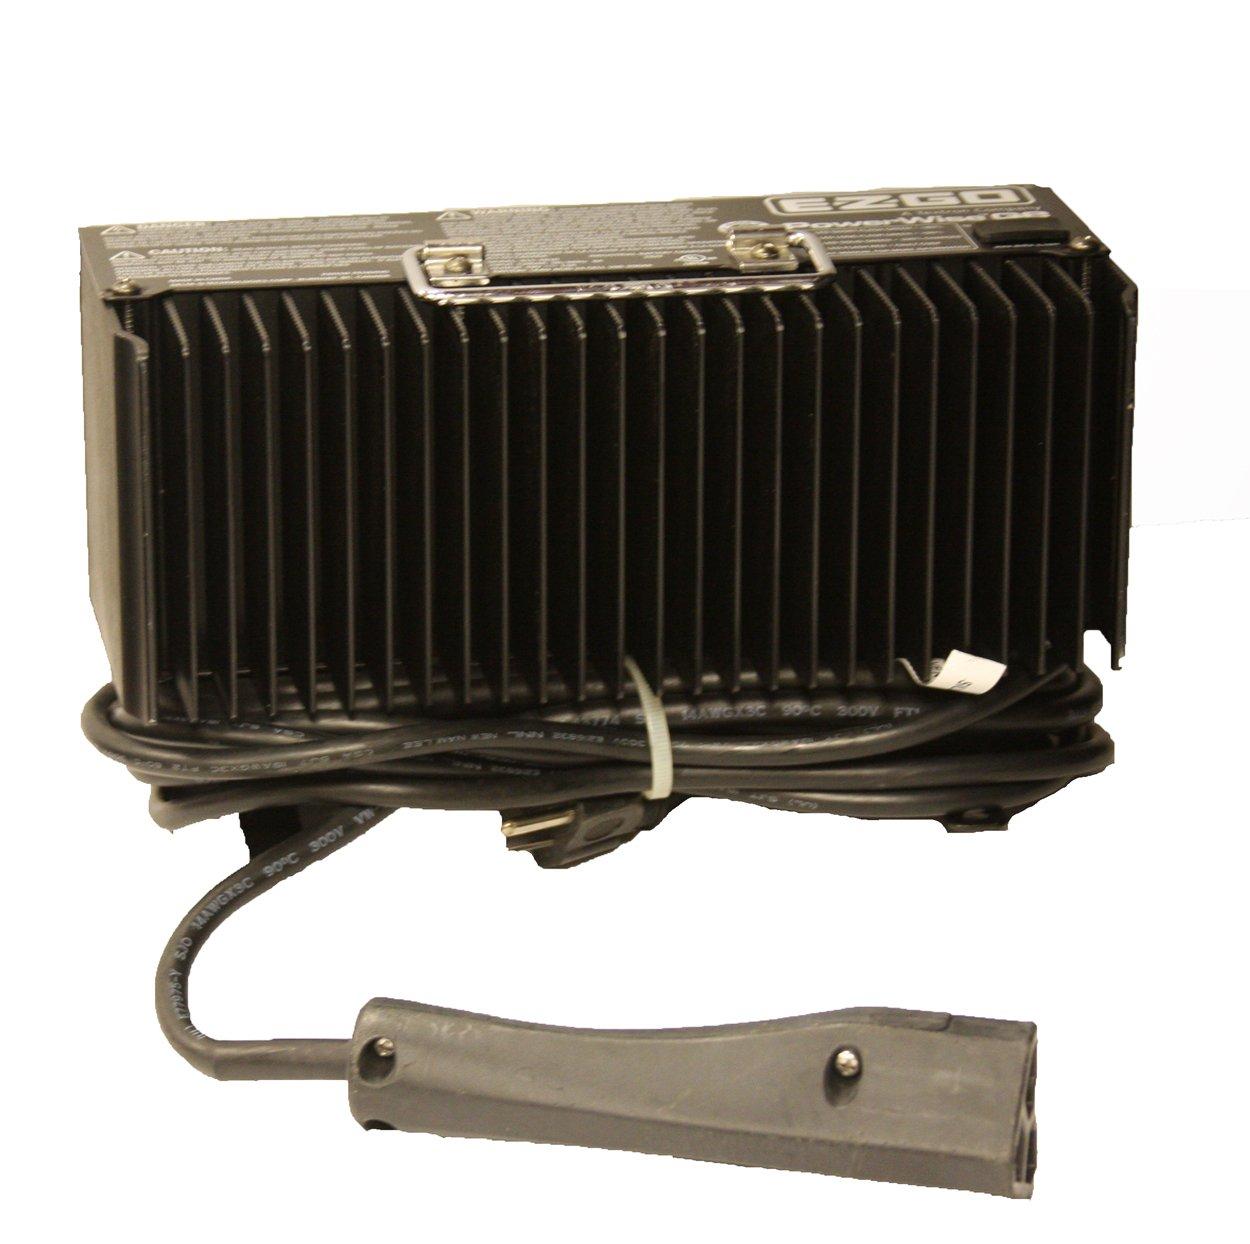 Ezgo 48v Golf Cart Battery Charger Refurb 617615 Textron Ez Go Workhorse Wiring Diagram Garden Outdoor